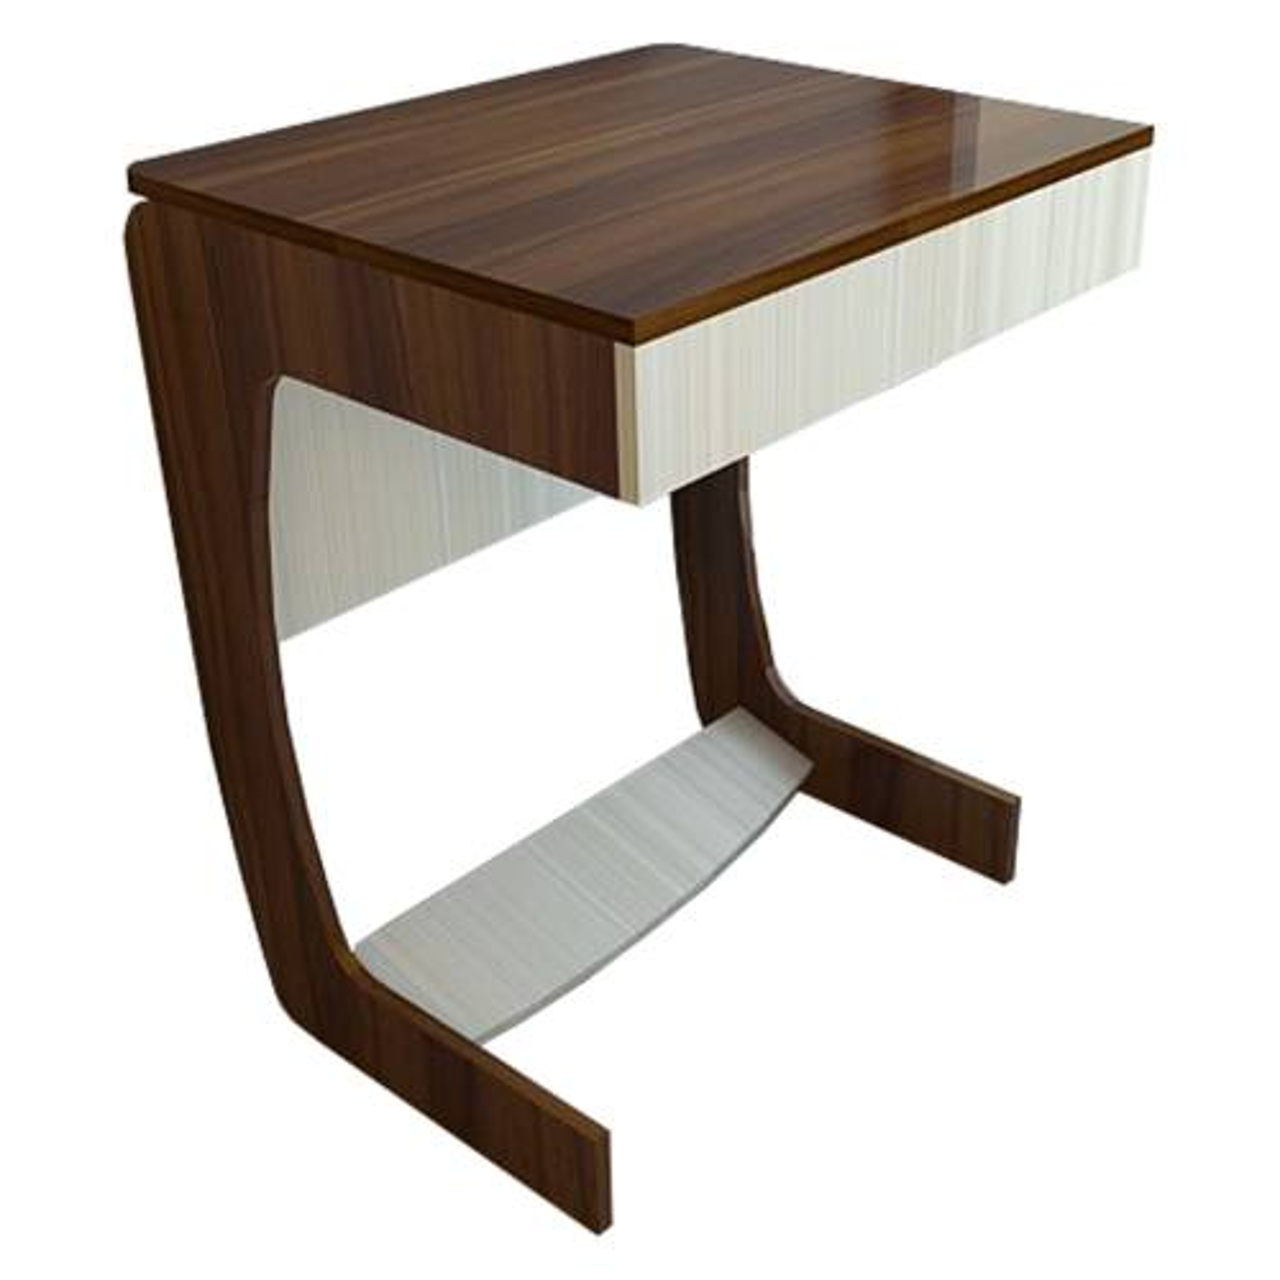 میز کامپیوتر انتخاب اول مدل TO-252